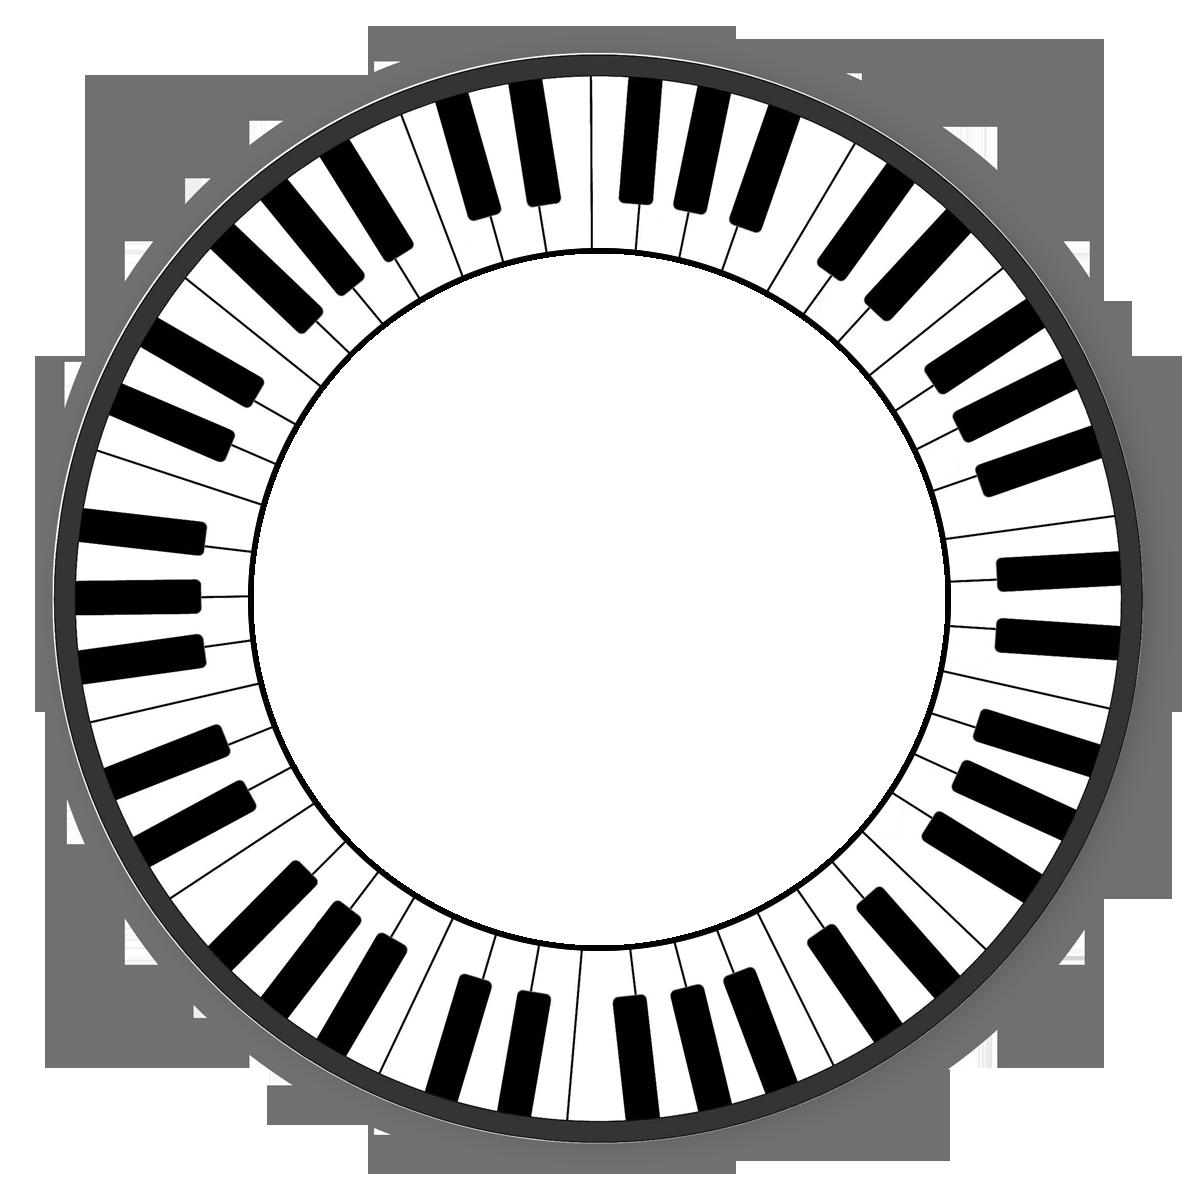 Pin oleh Светлана di Рамки (Dengan gambar)